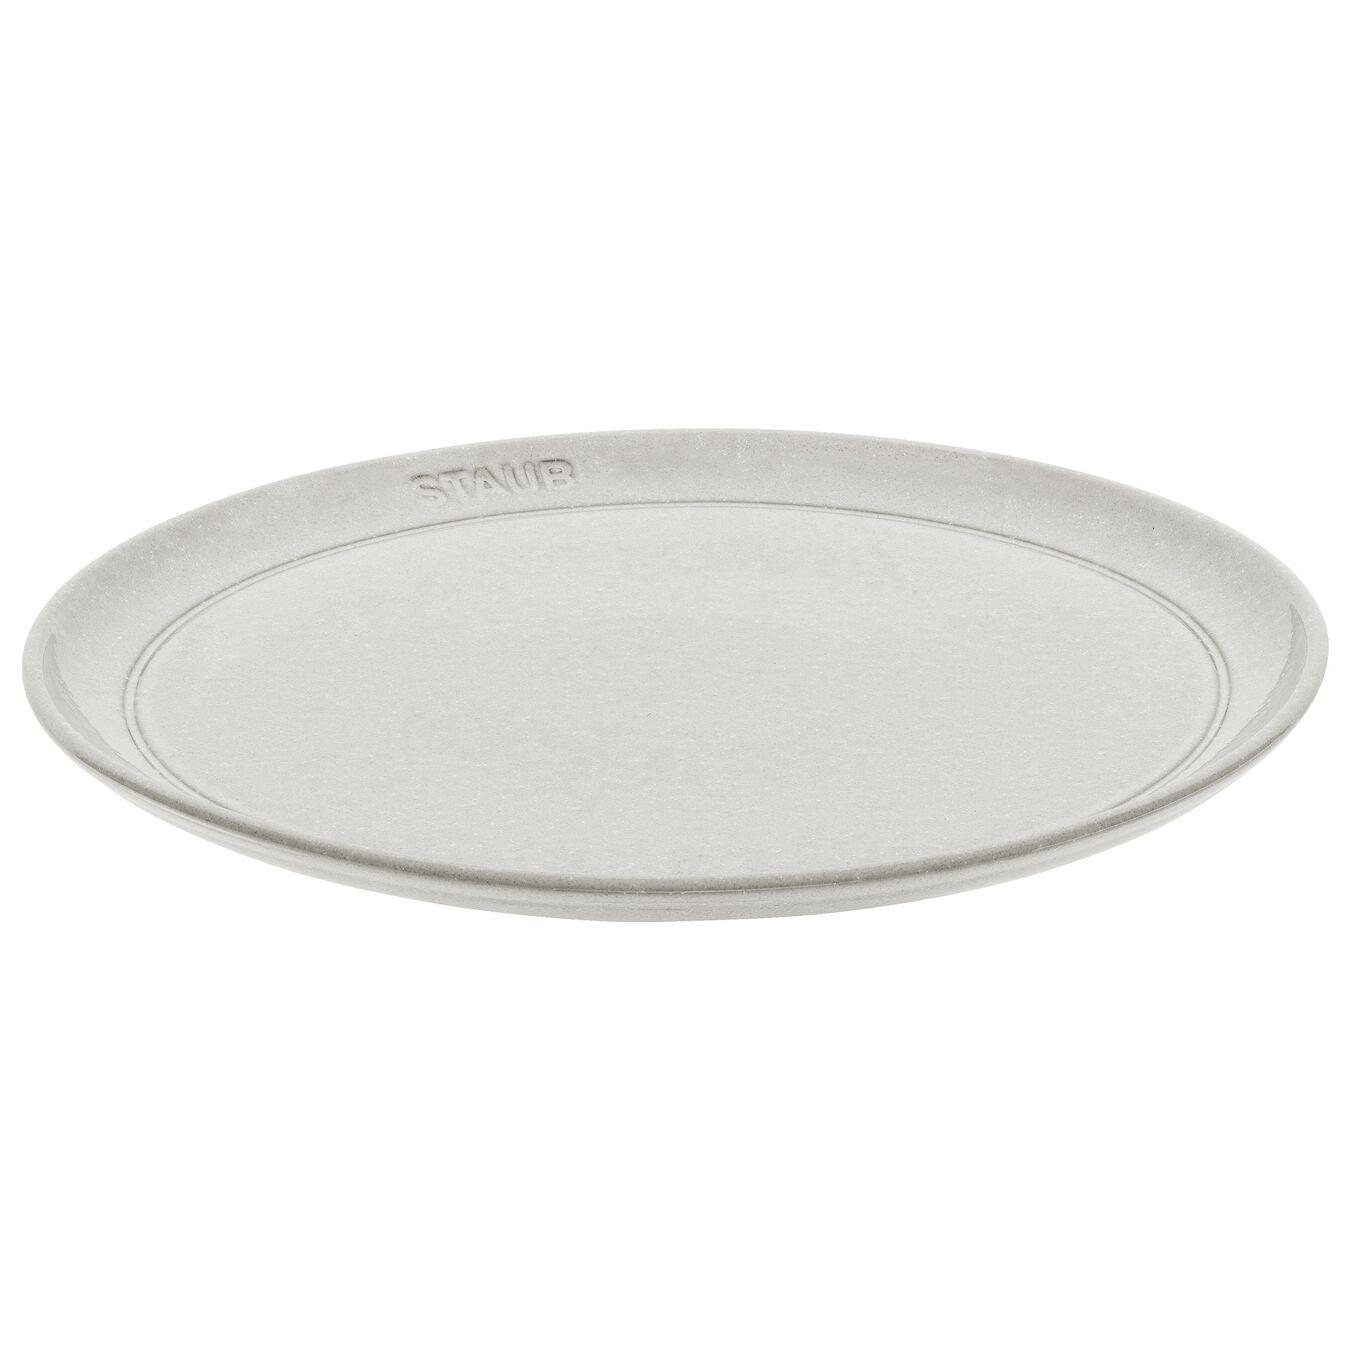 Pasta plate set, 4 Piece | white truffle | Ceramic | round | Ceramic,,large 2